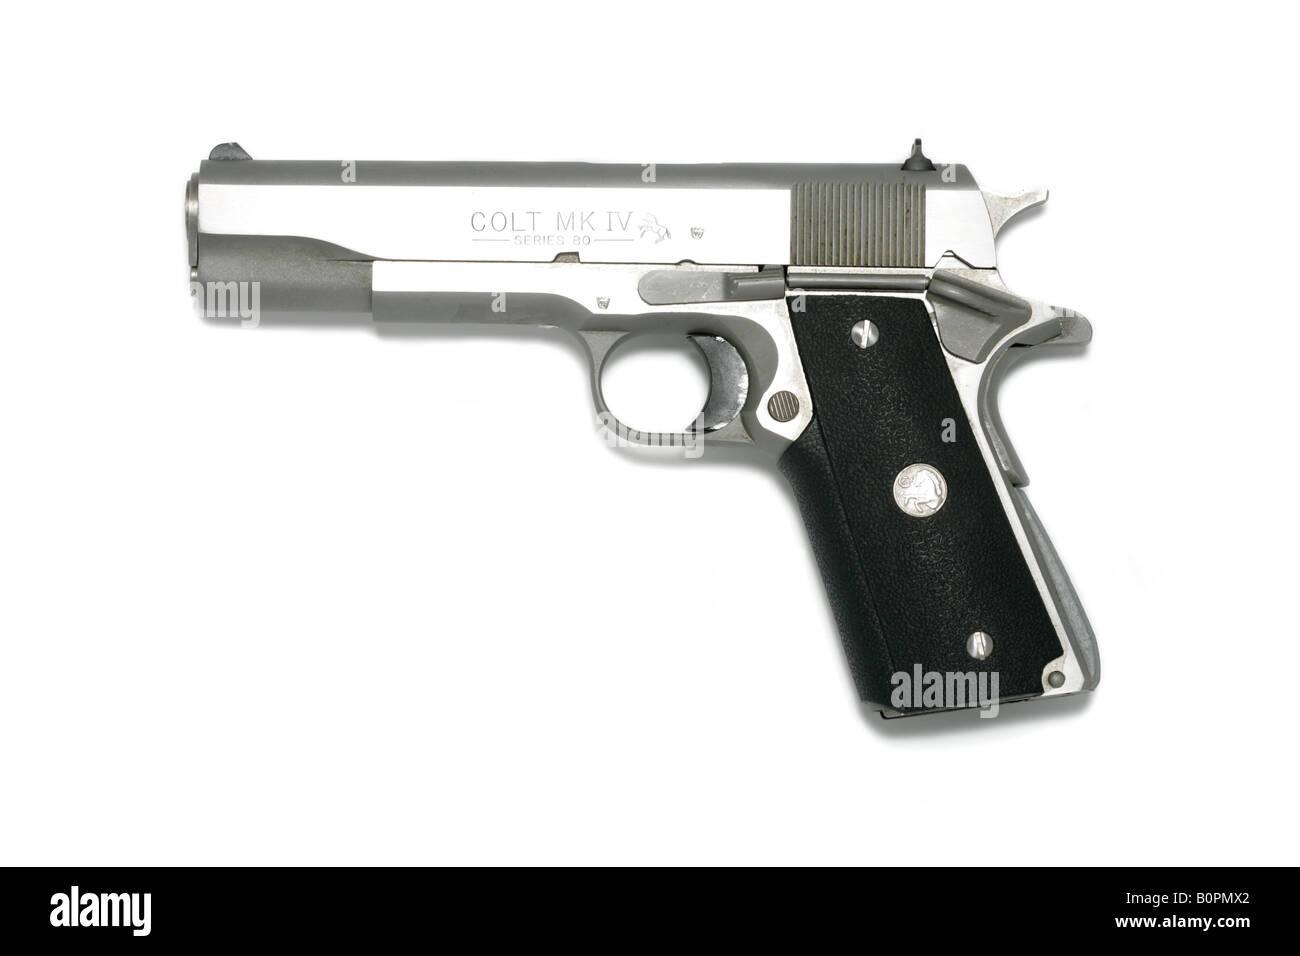 hand gun handgun pistol colt MK IV series 80 - Stock Image